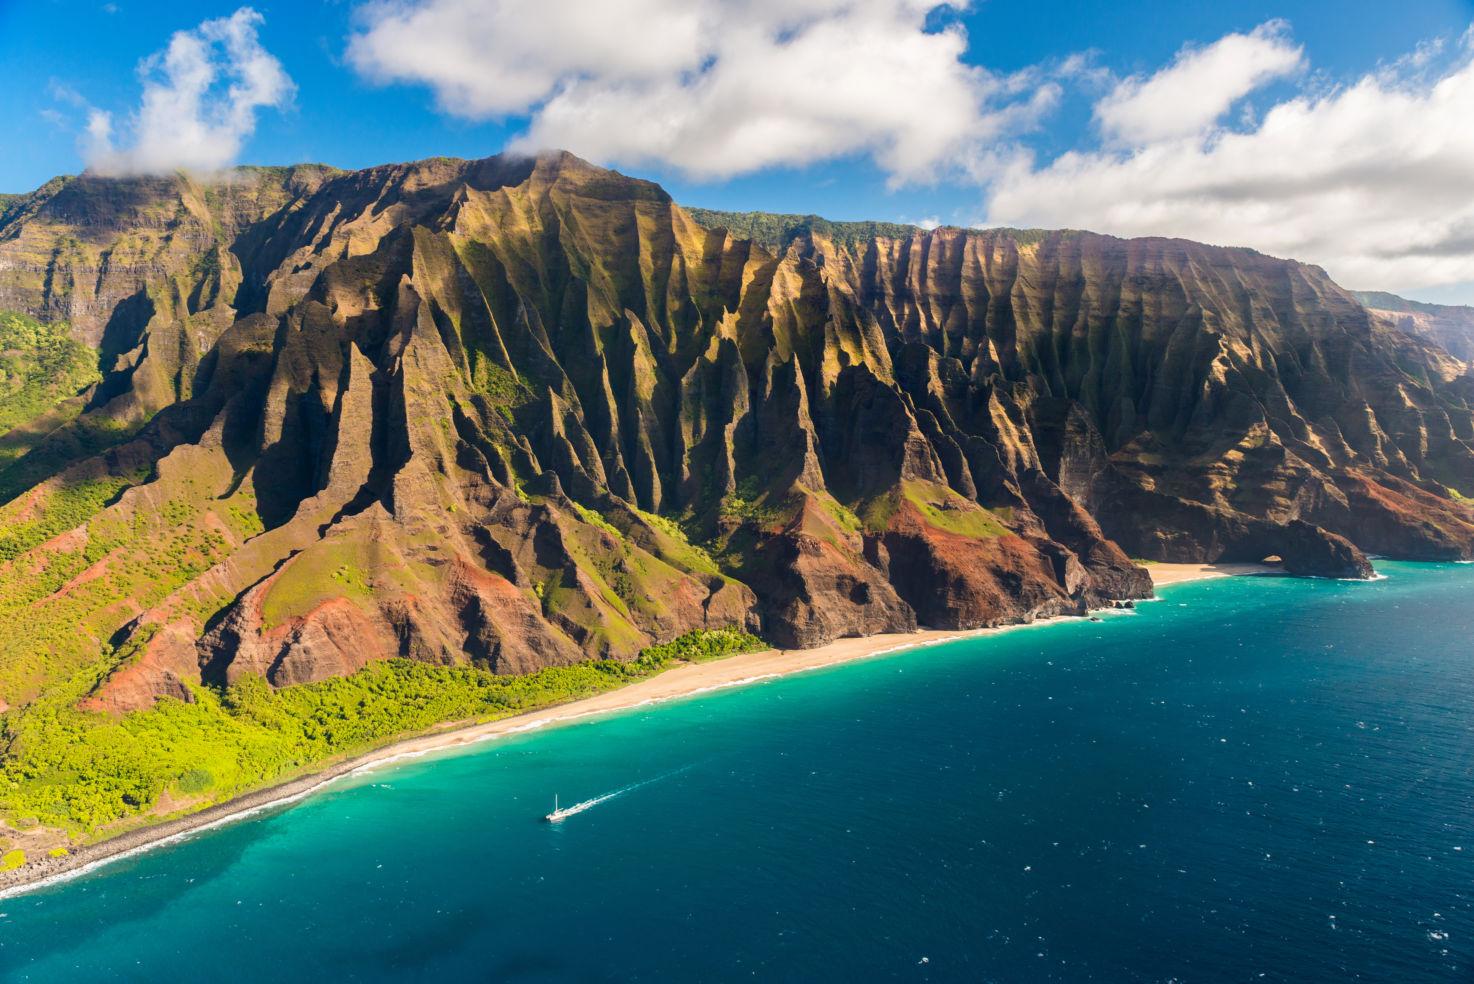 Na Pali coastline in Hawaii on the island of Kauai